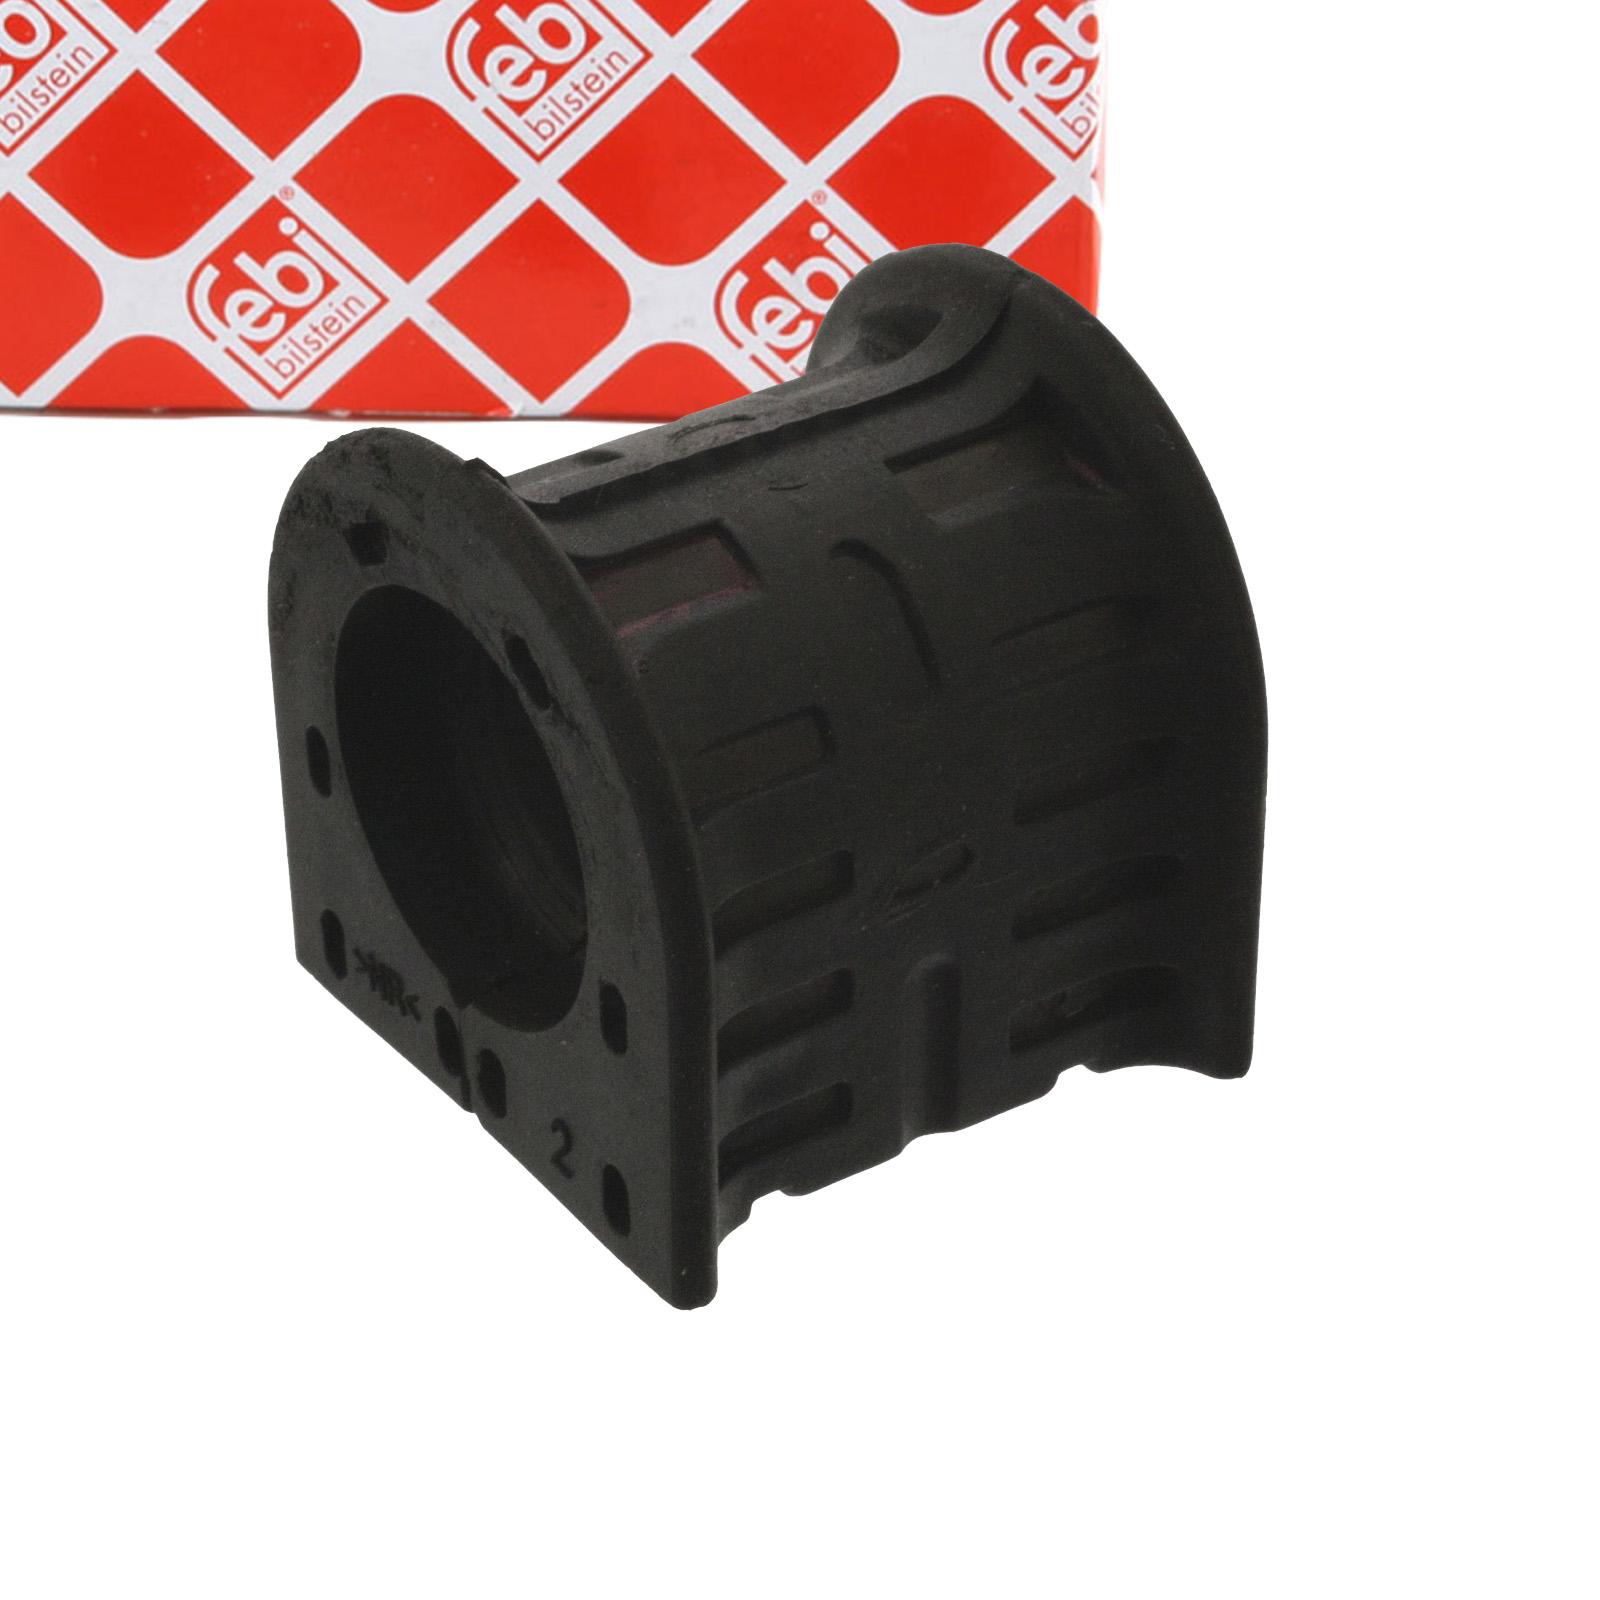 2x FEBI 44539 Stabilisatorlager NISSAN NV400 OPEL Movano B RENAULT Master 3 hinten